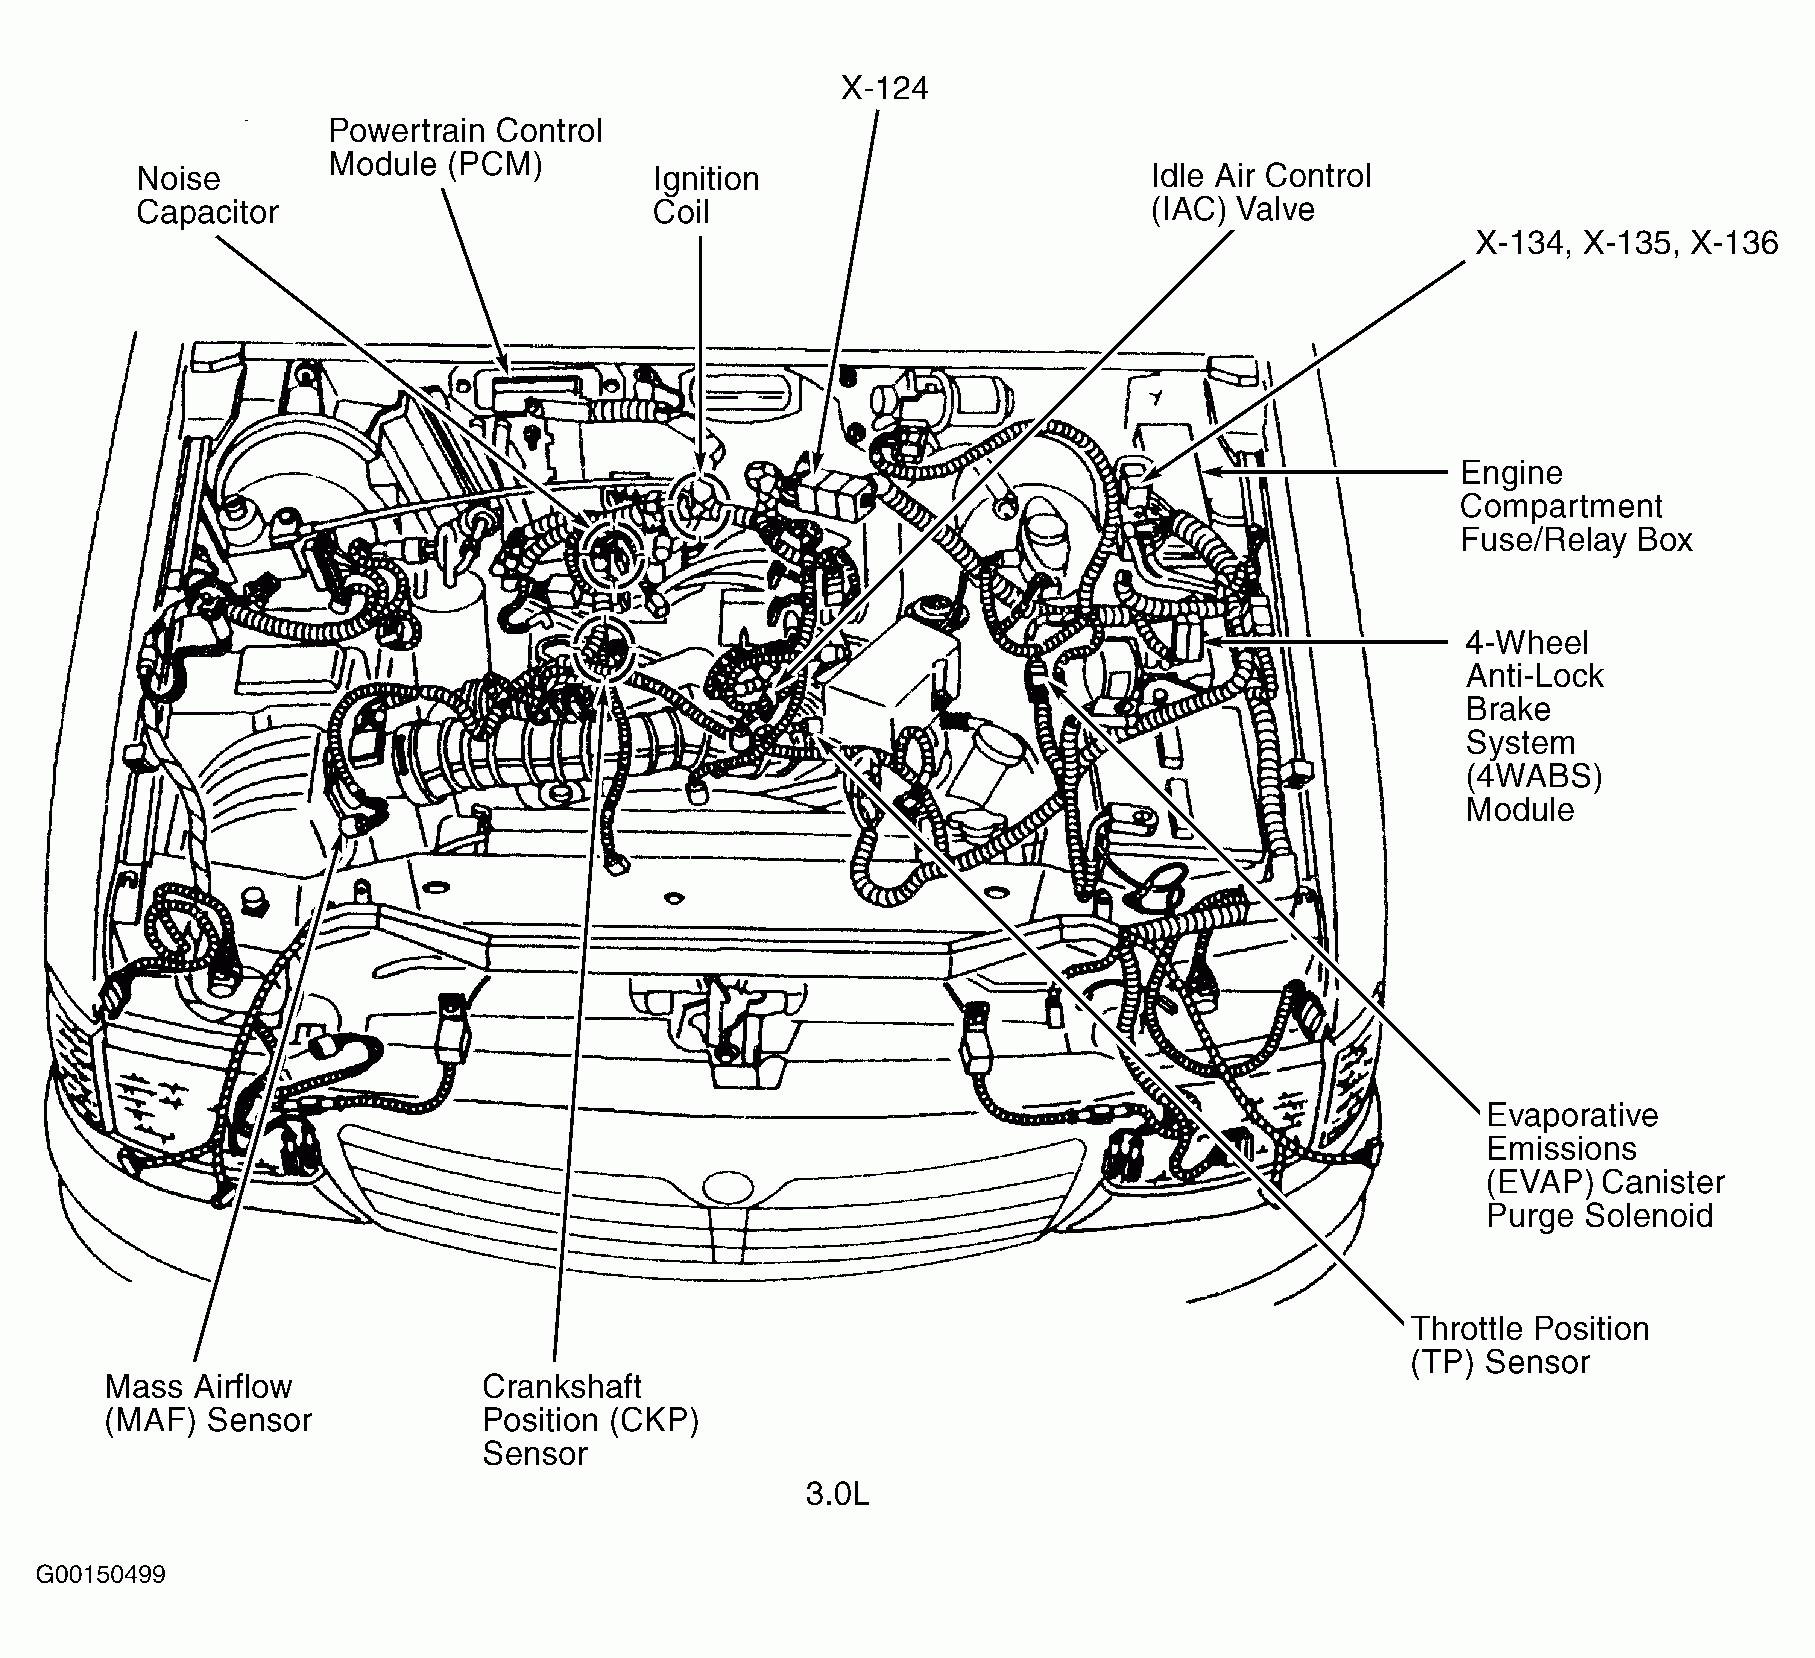 8 Cylinder Engine Diagram Mazda 6 Engine Diagram Data Schematics Wiring Diagram • Of 8 Cylinder Engine Diagram